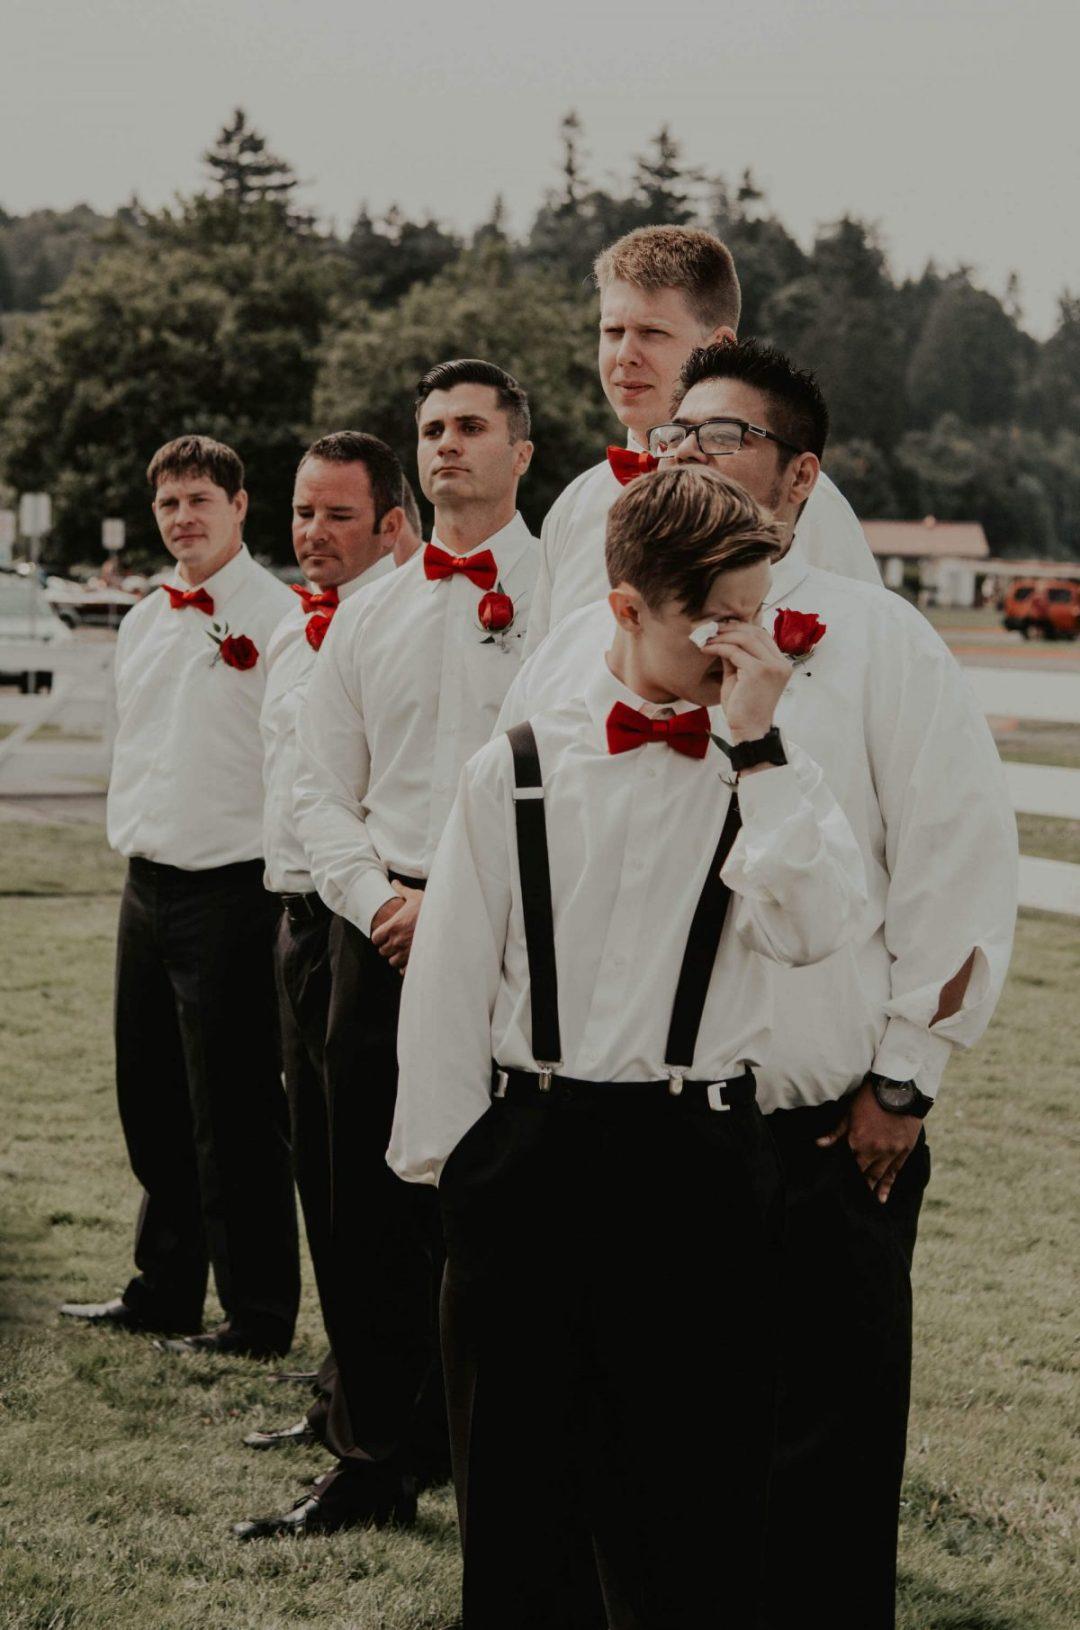 Mukilteo-Wedding, Mukilteo-Lighthouse, Mukilteo-Lighthouse-Wedding, Mukilteo-Wedding-Photography, Mukilteo-wedding-photos, seattle-wedding-photographer, washington-wedding-photos, backyard-wedding, seattle-wedding, northwest-wedding,